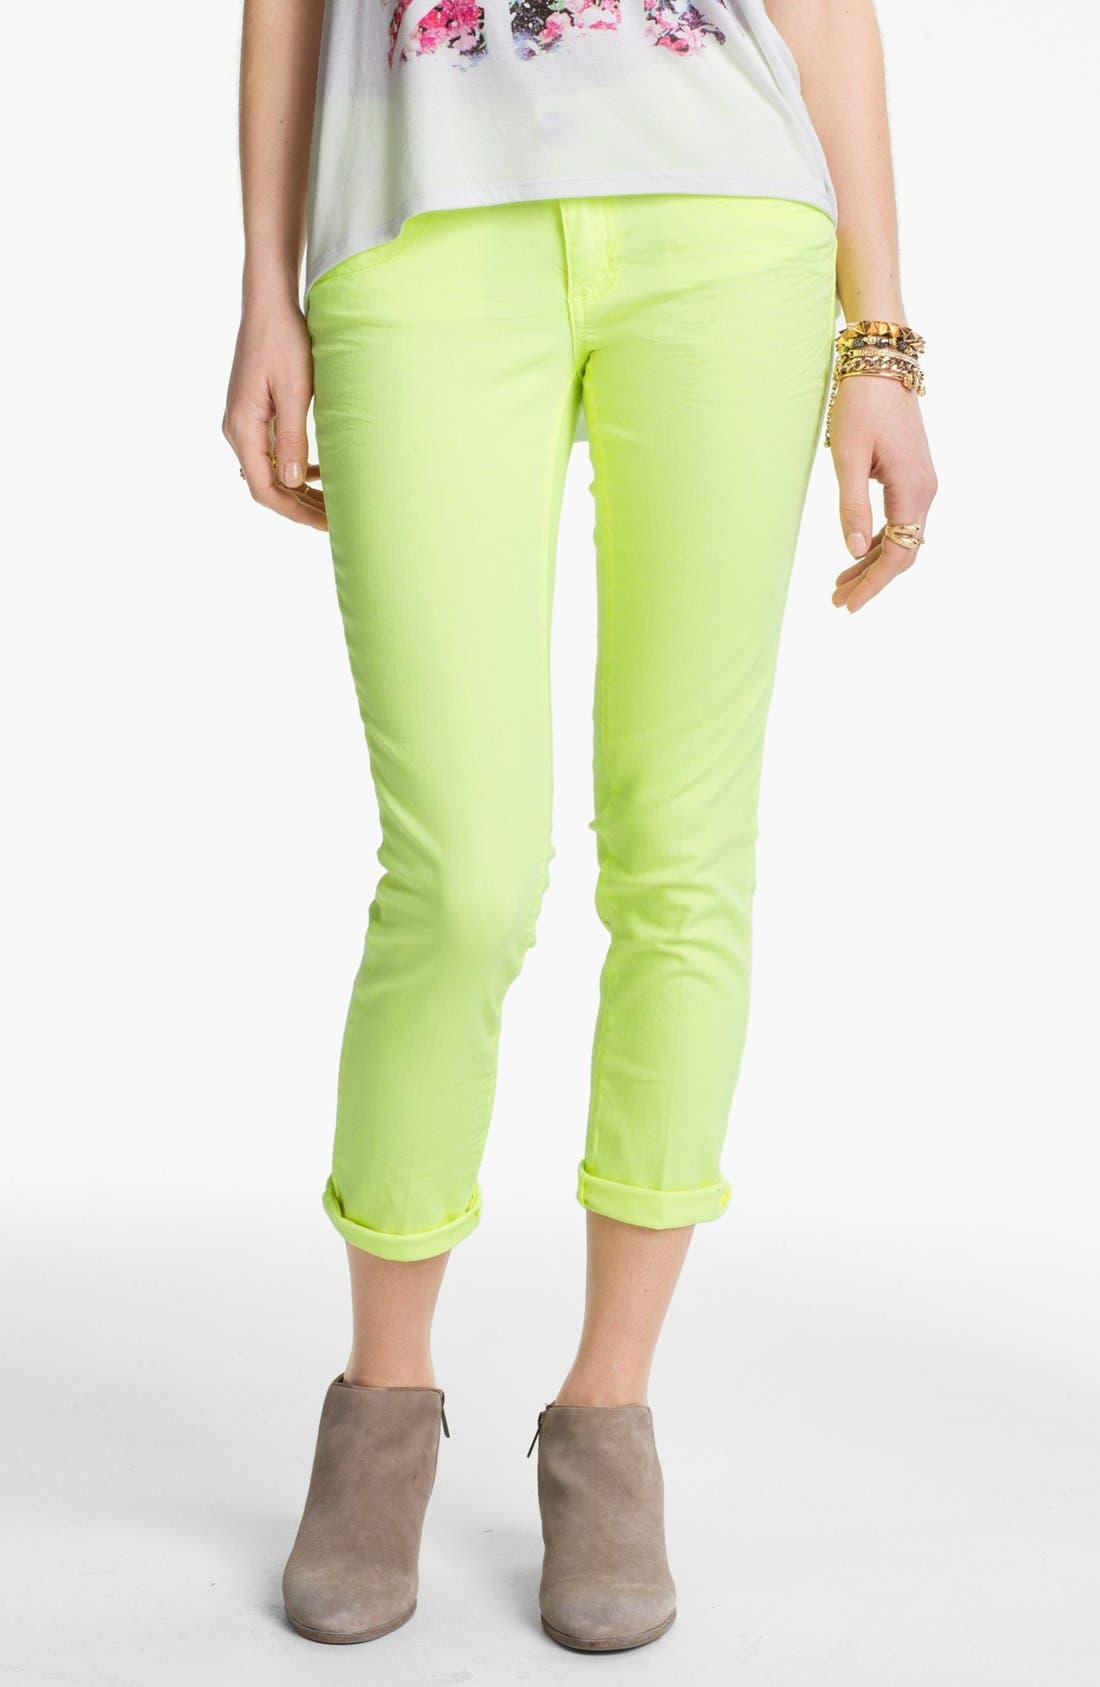 Alternate Image 1 Selected - Jolt Colored Crop Skinny Jeans (Juniors)